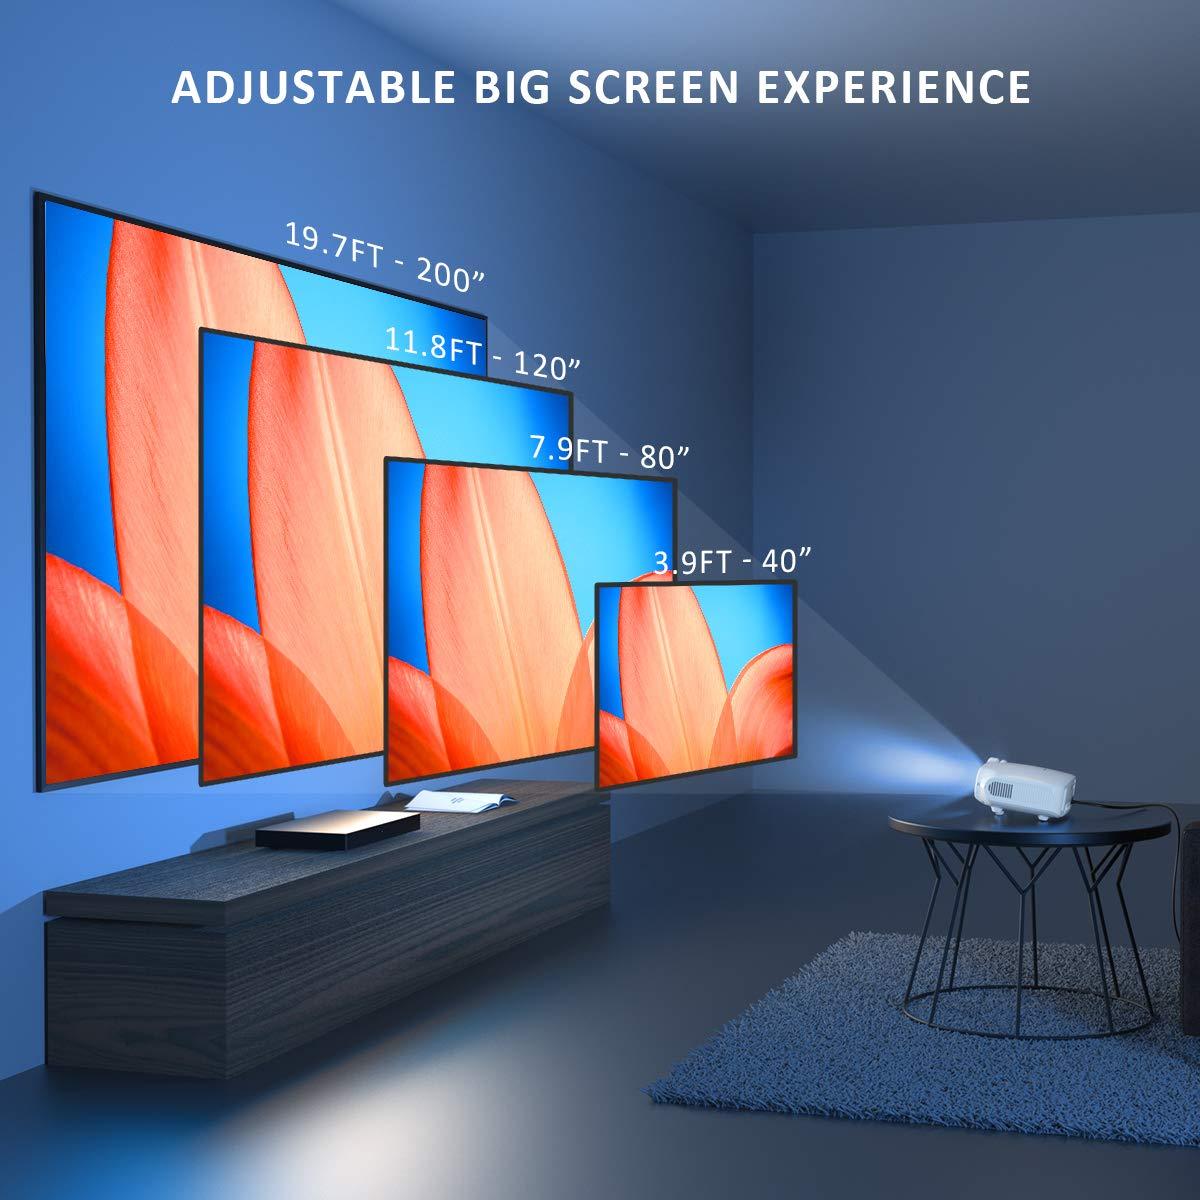 Crenova Proyector Mini Port/átil Proyector Cine en Casa con L/úmenes 3800 Soporte Full HD 1080p Proyector Rojo Resoluci/ón Nativa 720P Compatible con HDMI//USB//Tarjeta SD//VGA//AV//TV Box